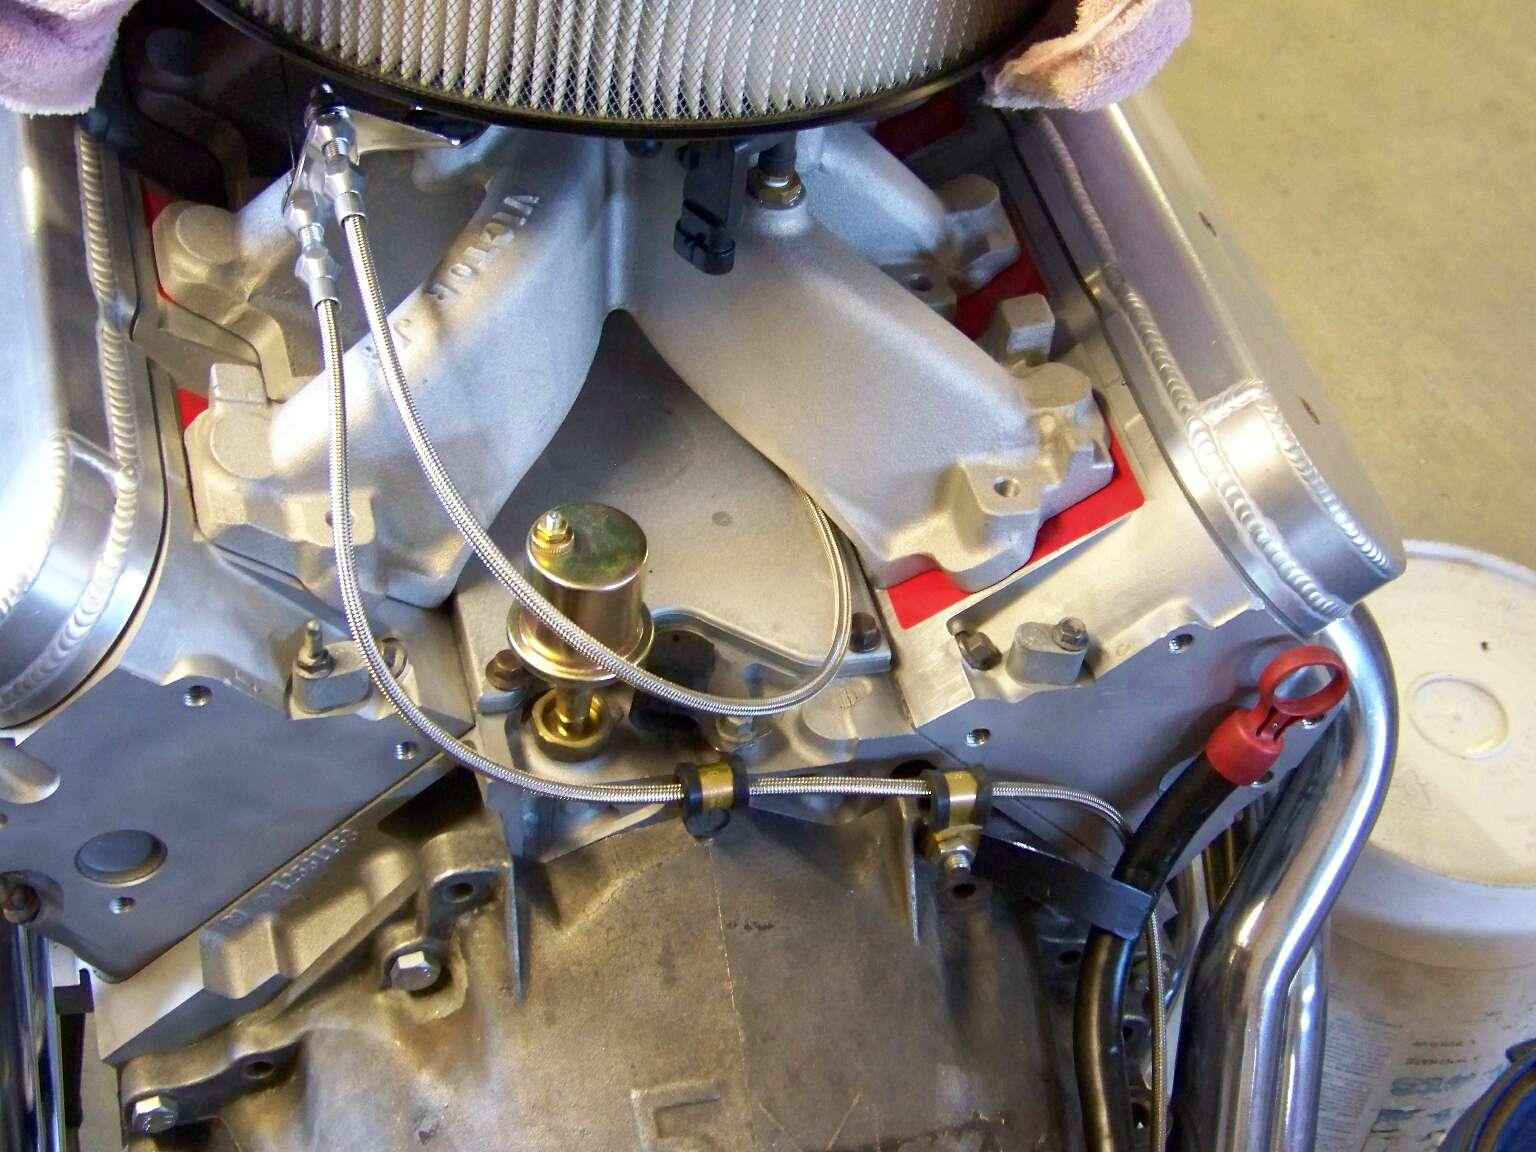 318 Engine Diagram 84 Dodge Carb Intake And Map Sensor Ideas Ls1tech Camaro And